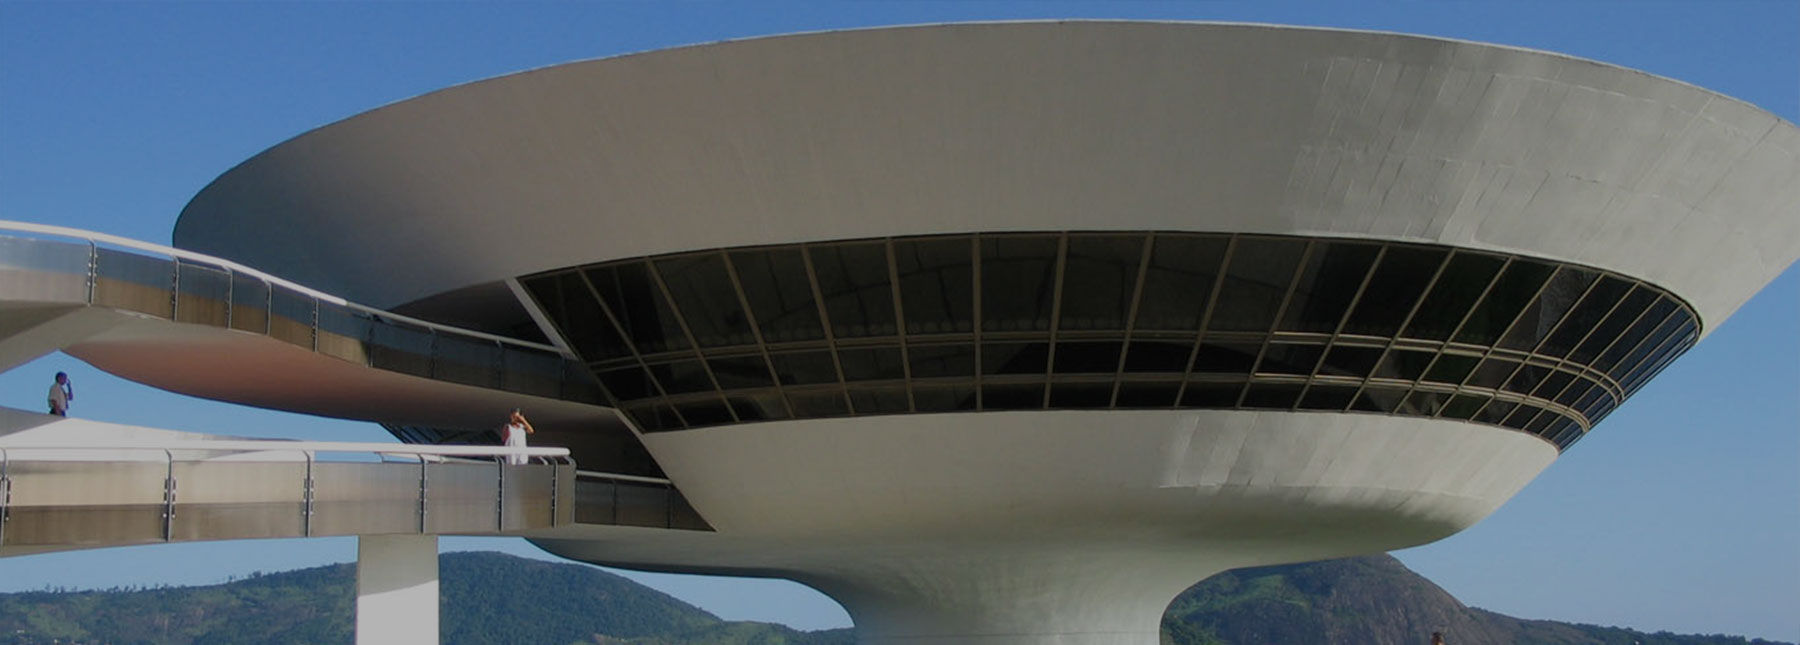 Viajes y Arquitectura